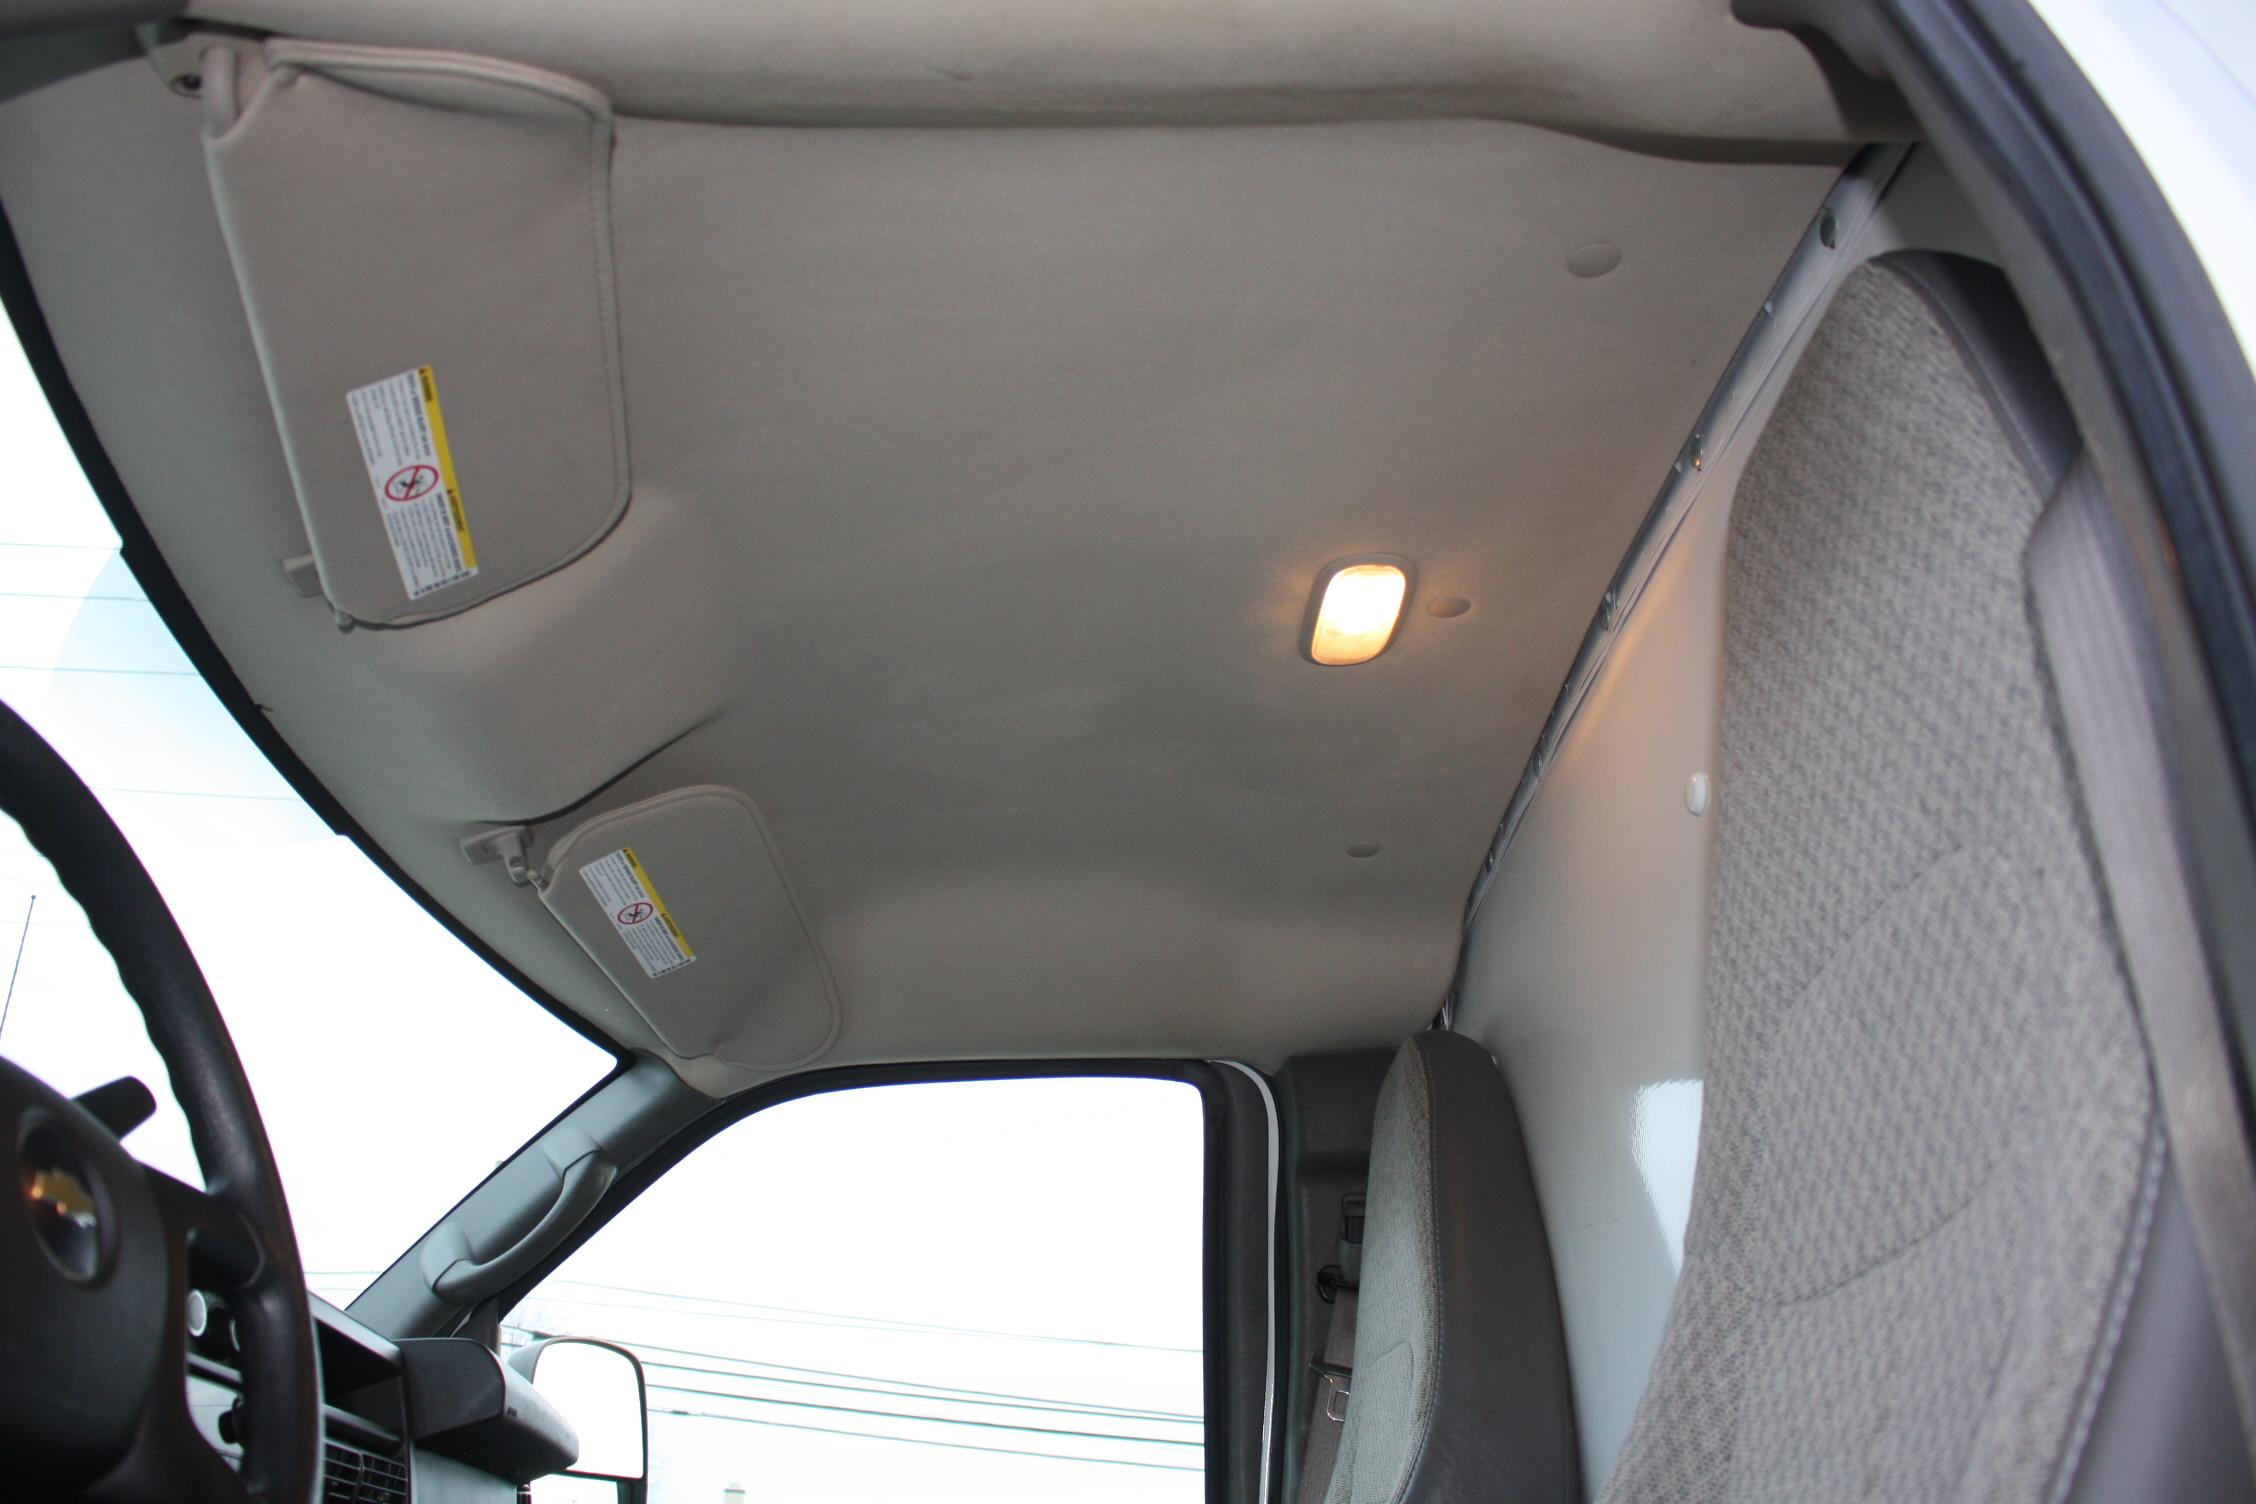 IMG 2526 - 2014 CHEVROLET G3500 BOX TRUCK